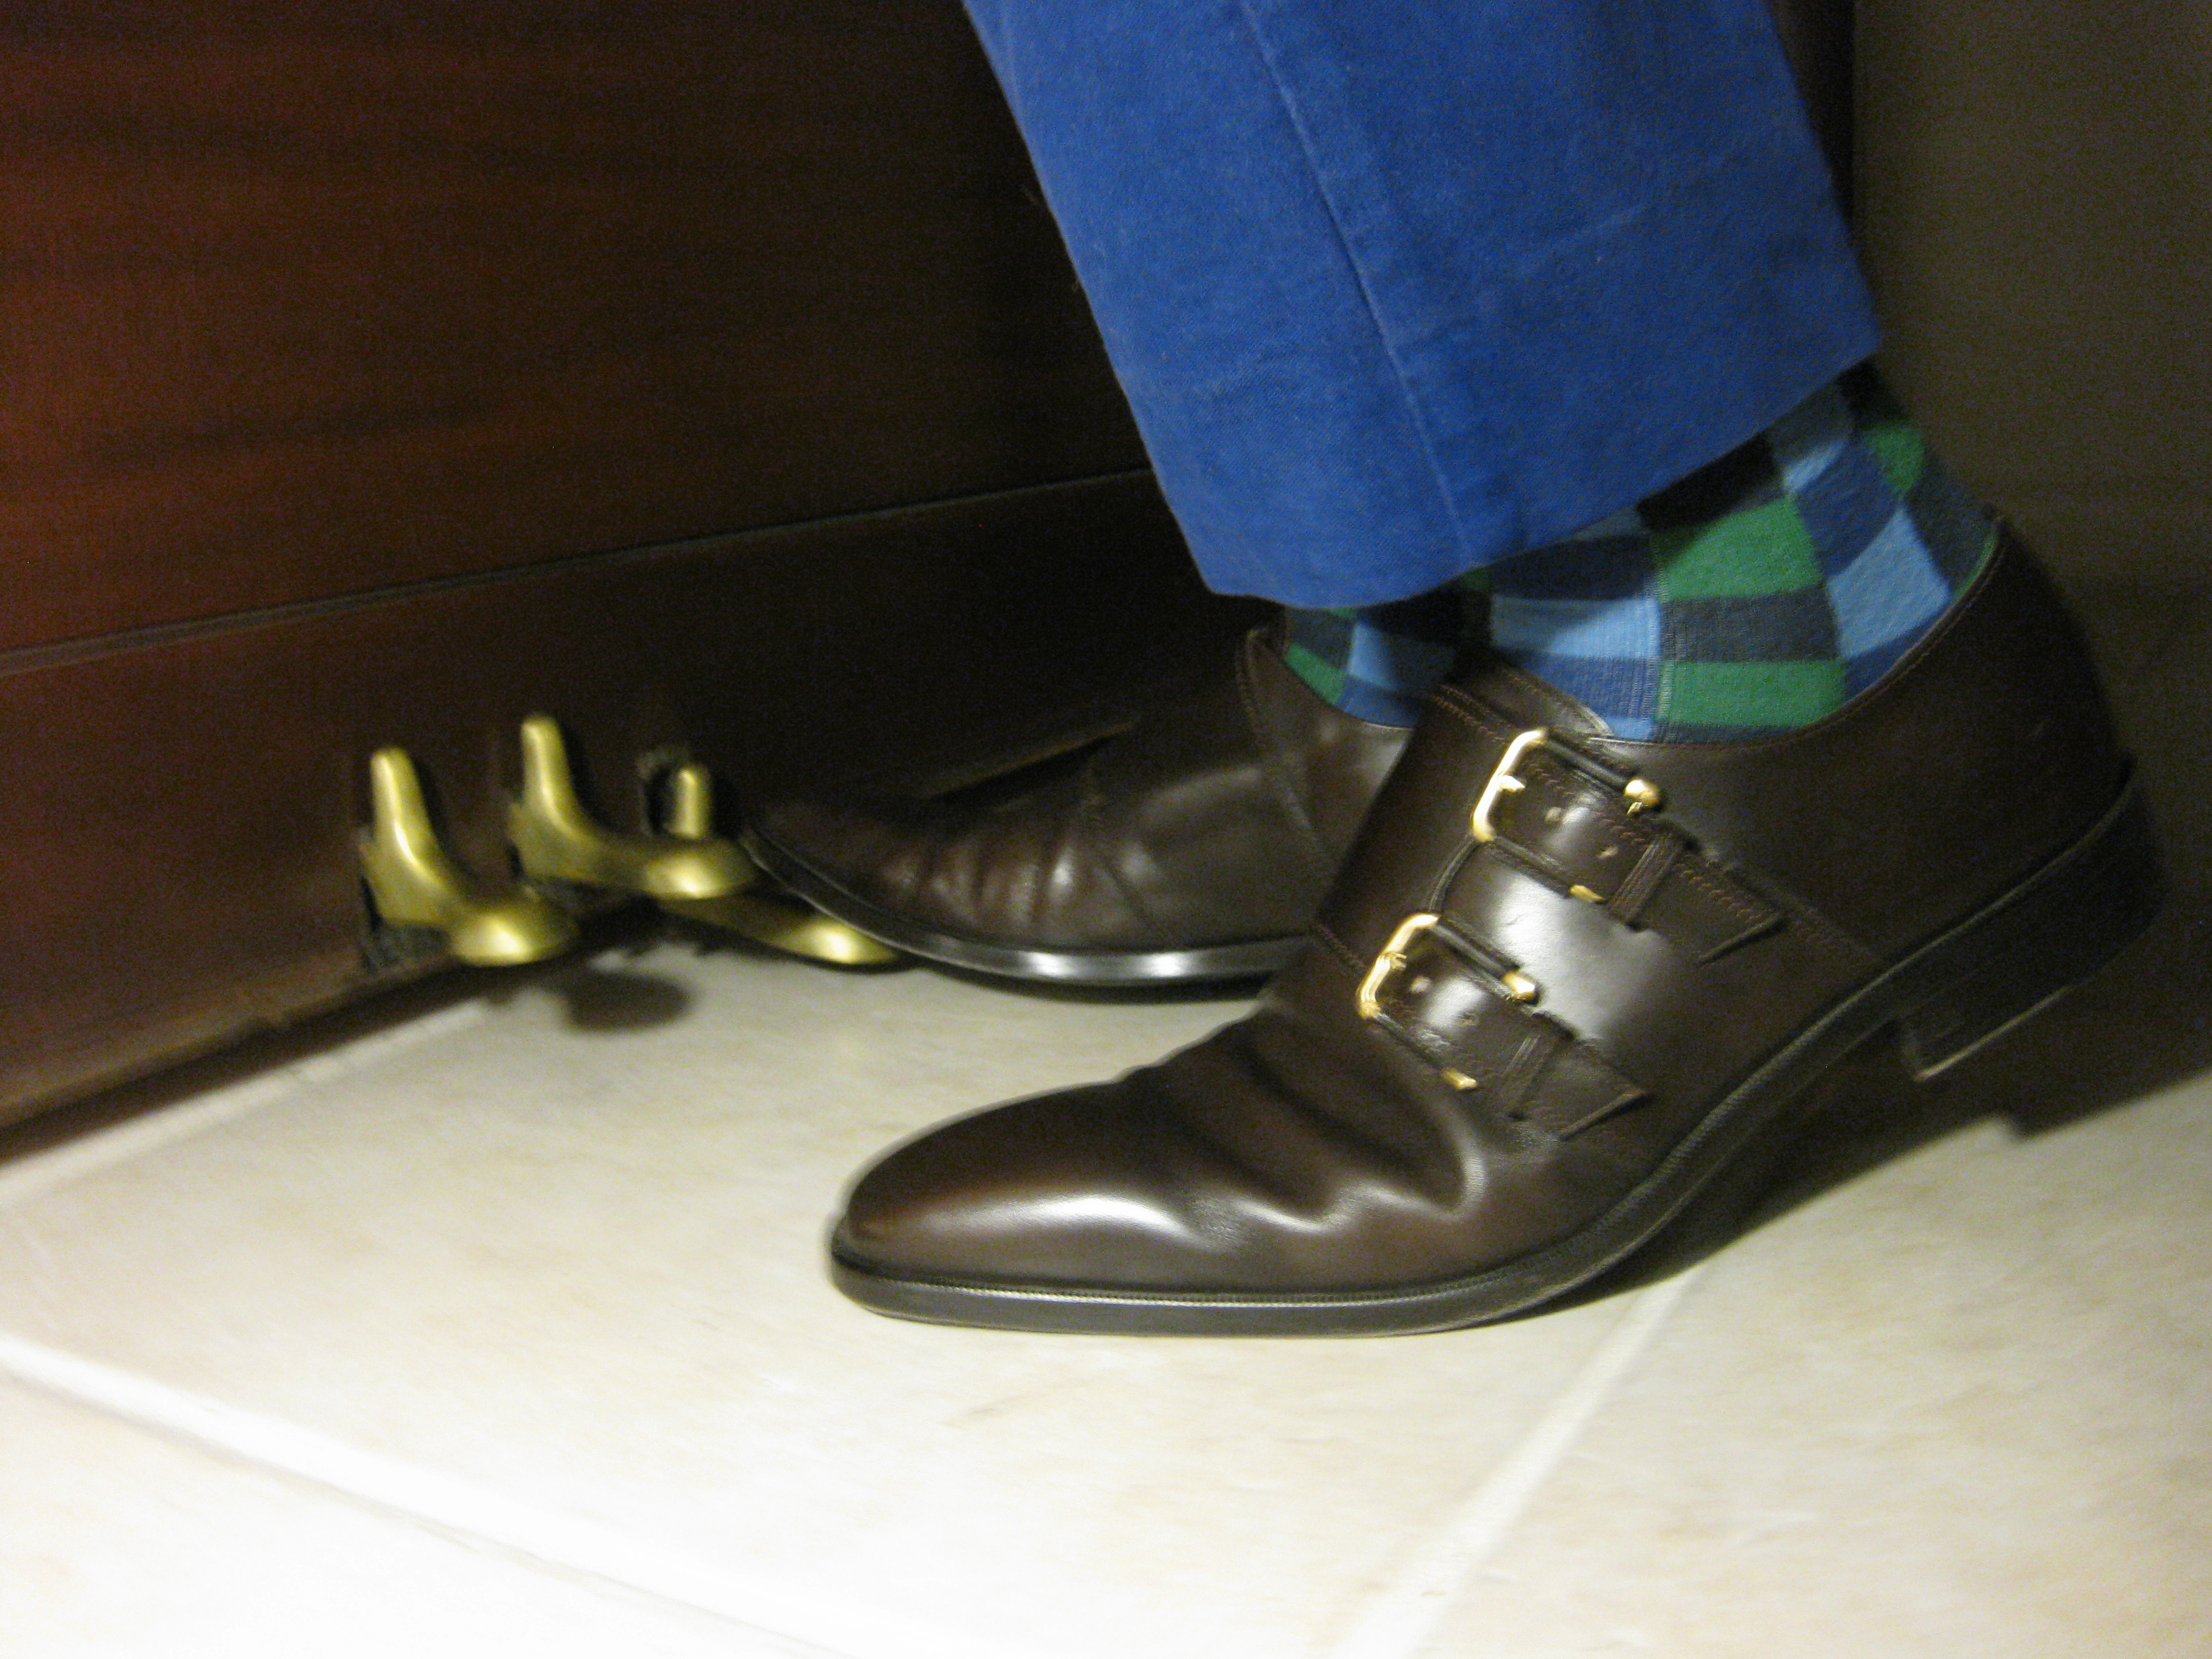 international jones tennis shoes and tuxedos